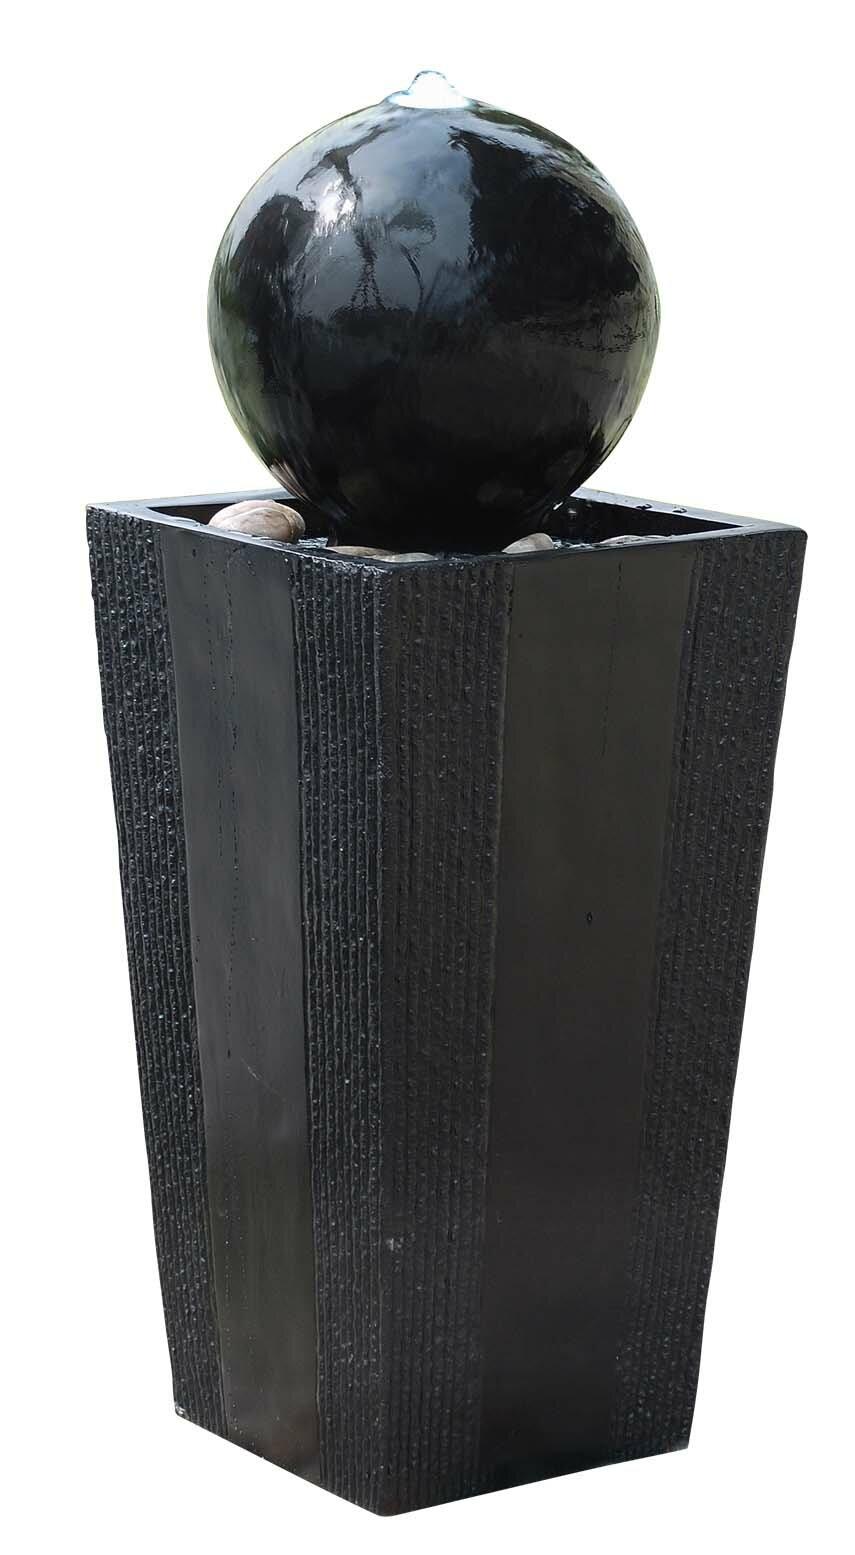 Alpine Fiberglass Ball On Stand Fountain With Led Light